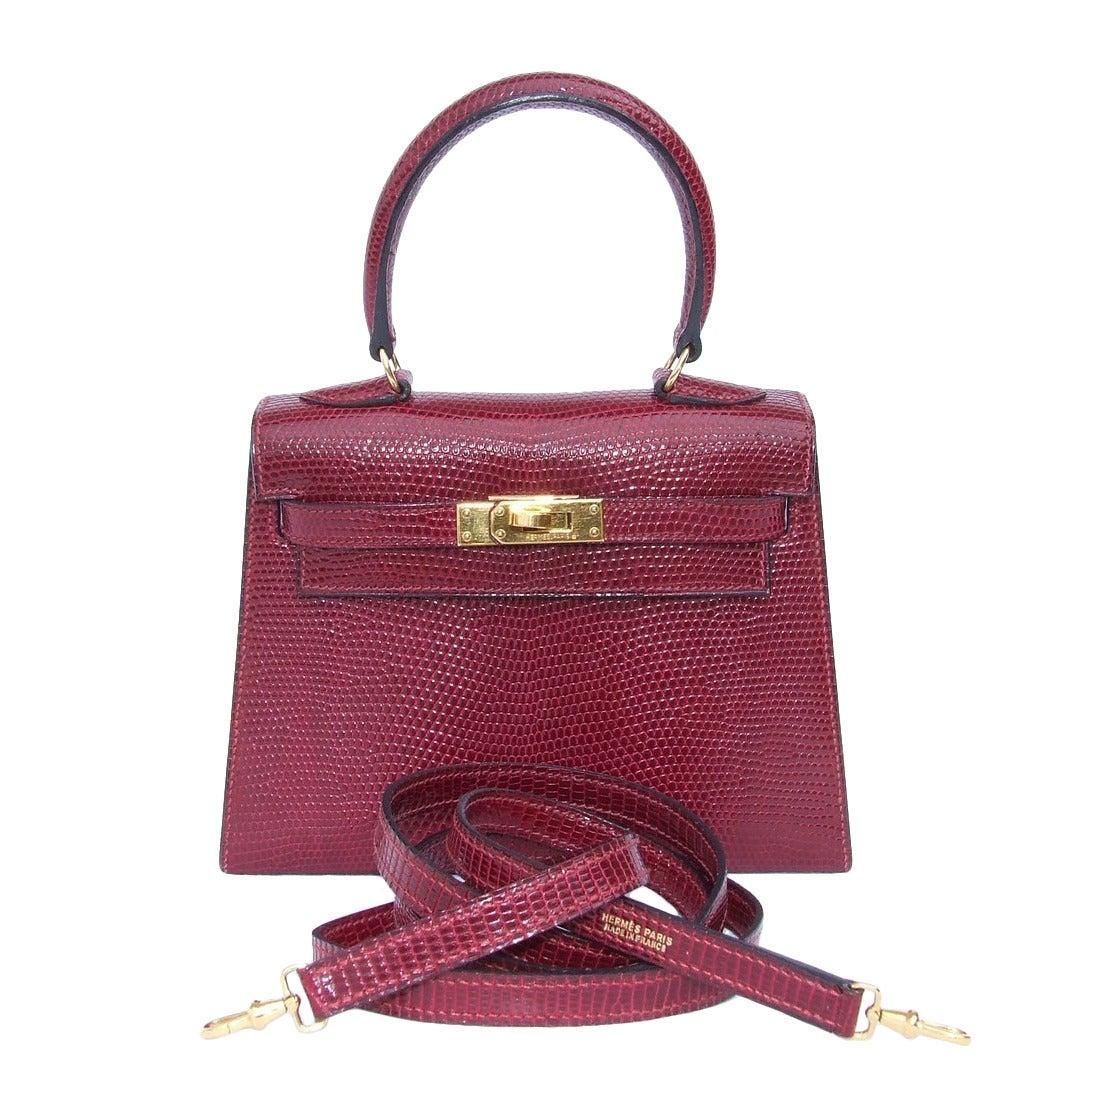 Authentic Hermes Mini Kelly 20 Bag 3 ways Rouge H Lizard ...